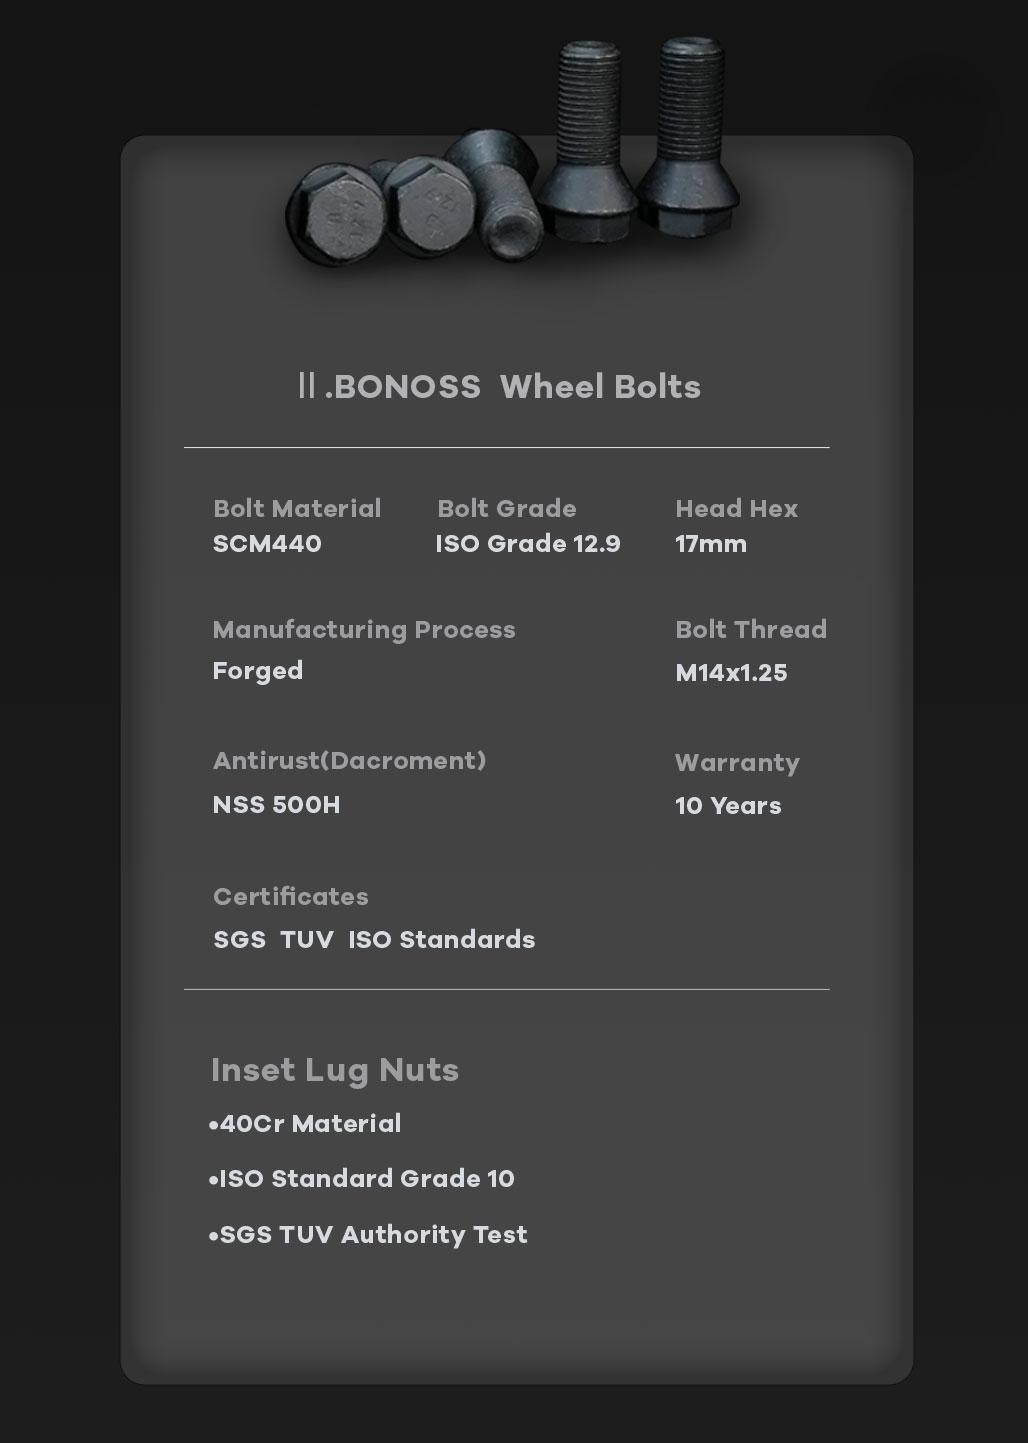 BONOSS-forged-active-cooling-5-Lug-wheel-spacers-(custom-wheel-spacers)-M14x1.25-by-lulu-10